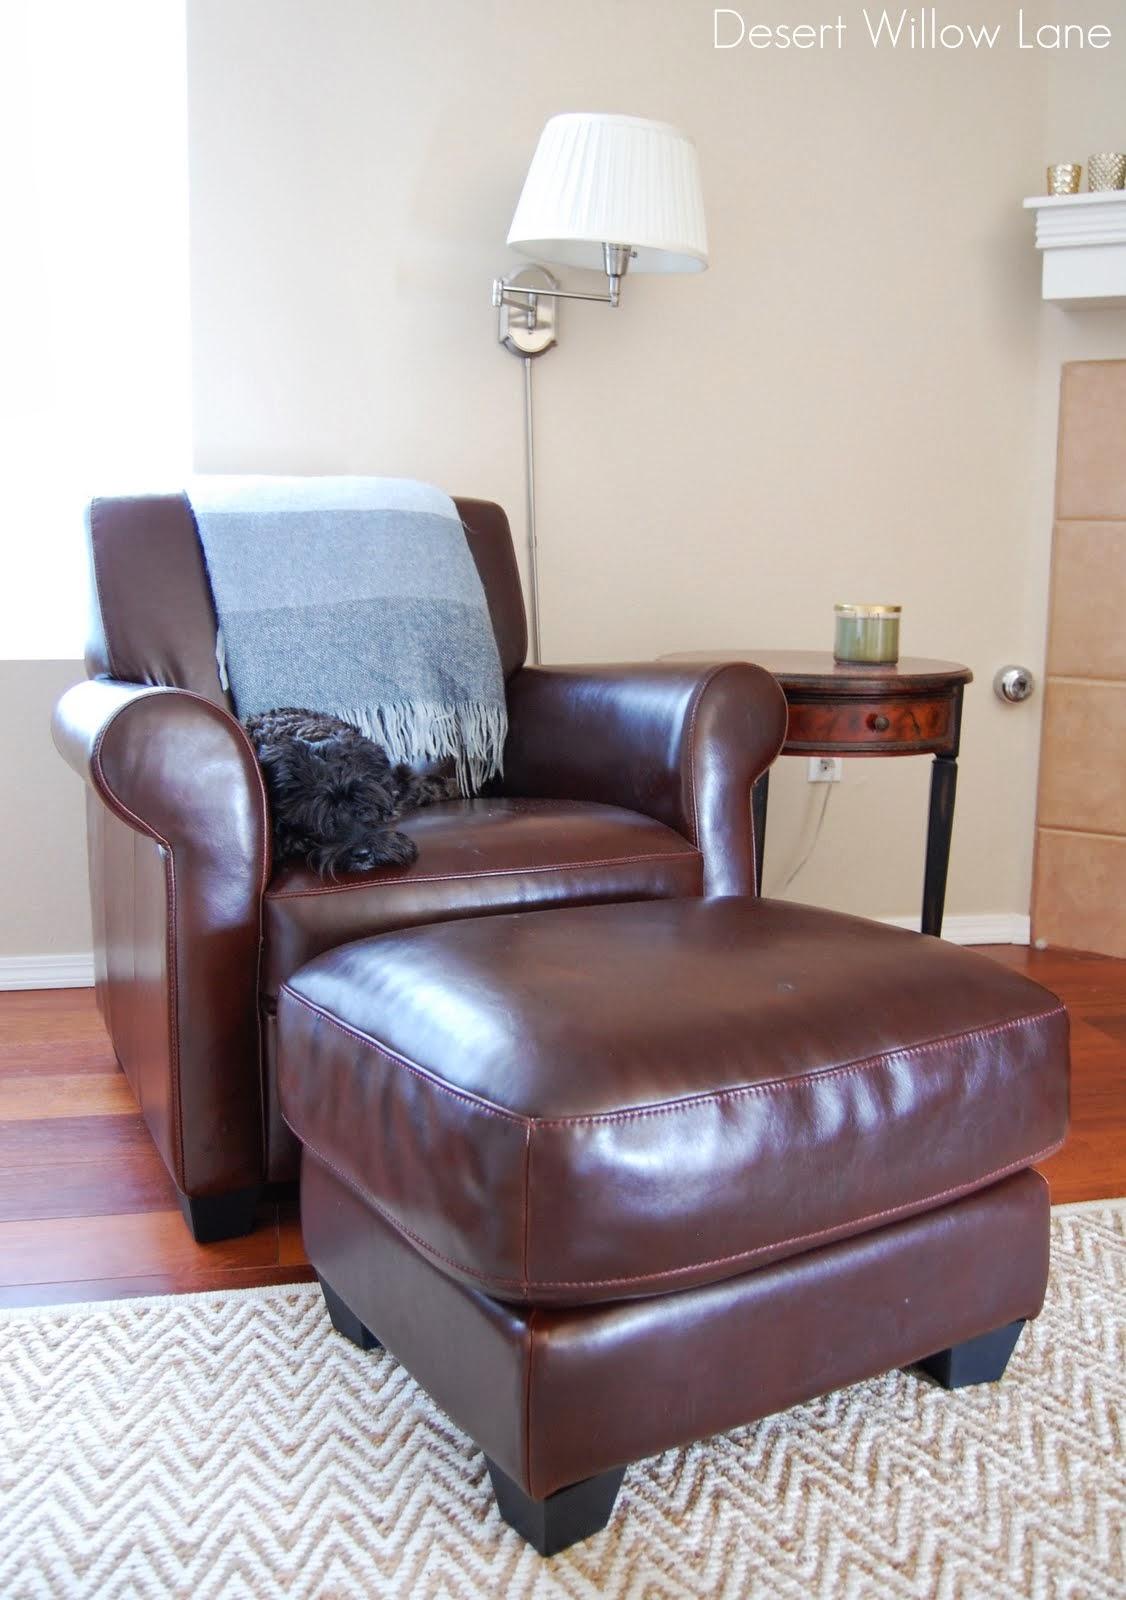 Miraculous Distressing New Leather Furniture Diy Desert Willow Lane Ibusinesslaw Wood Chair Design Ideas Ibusinesslaworg